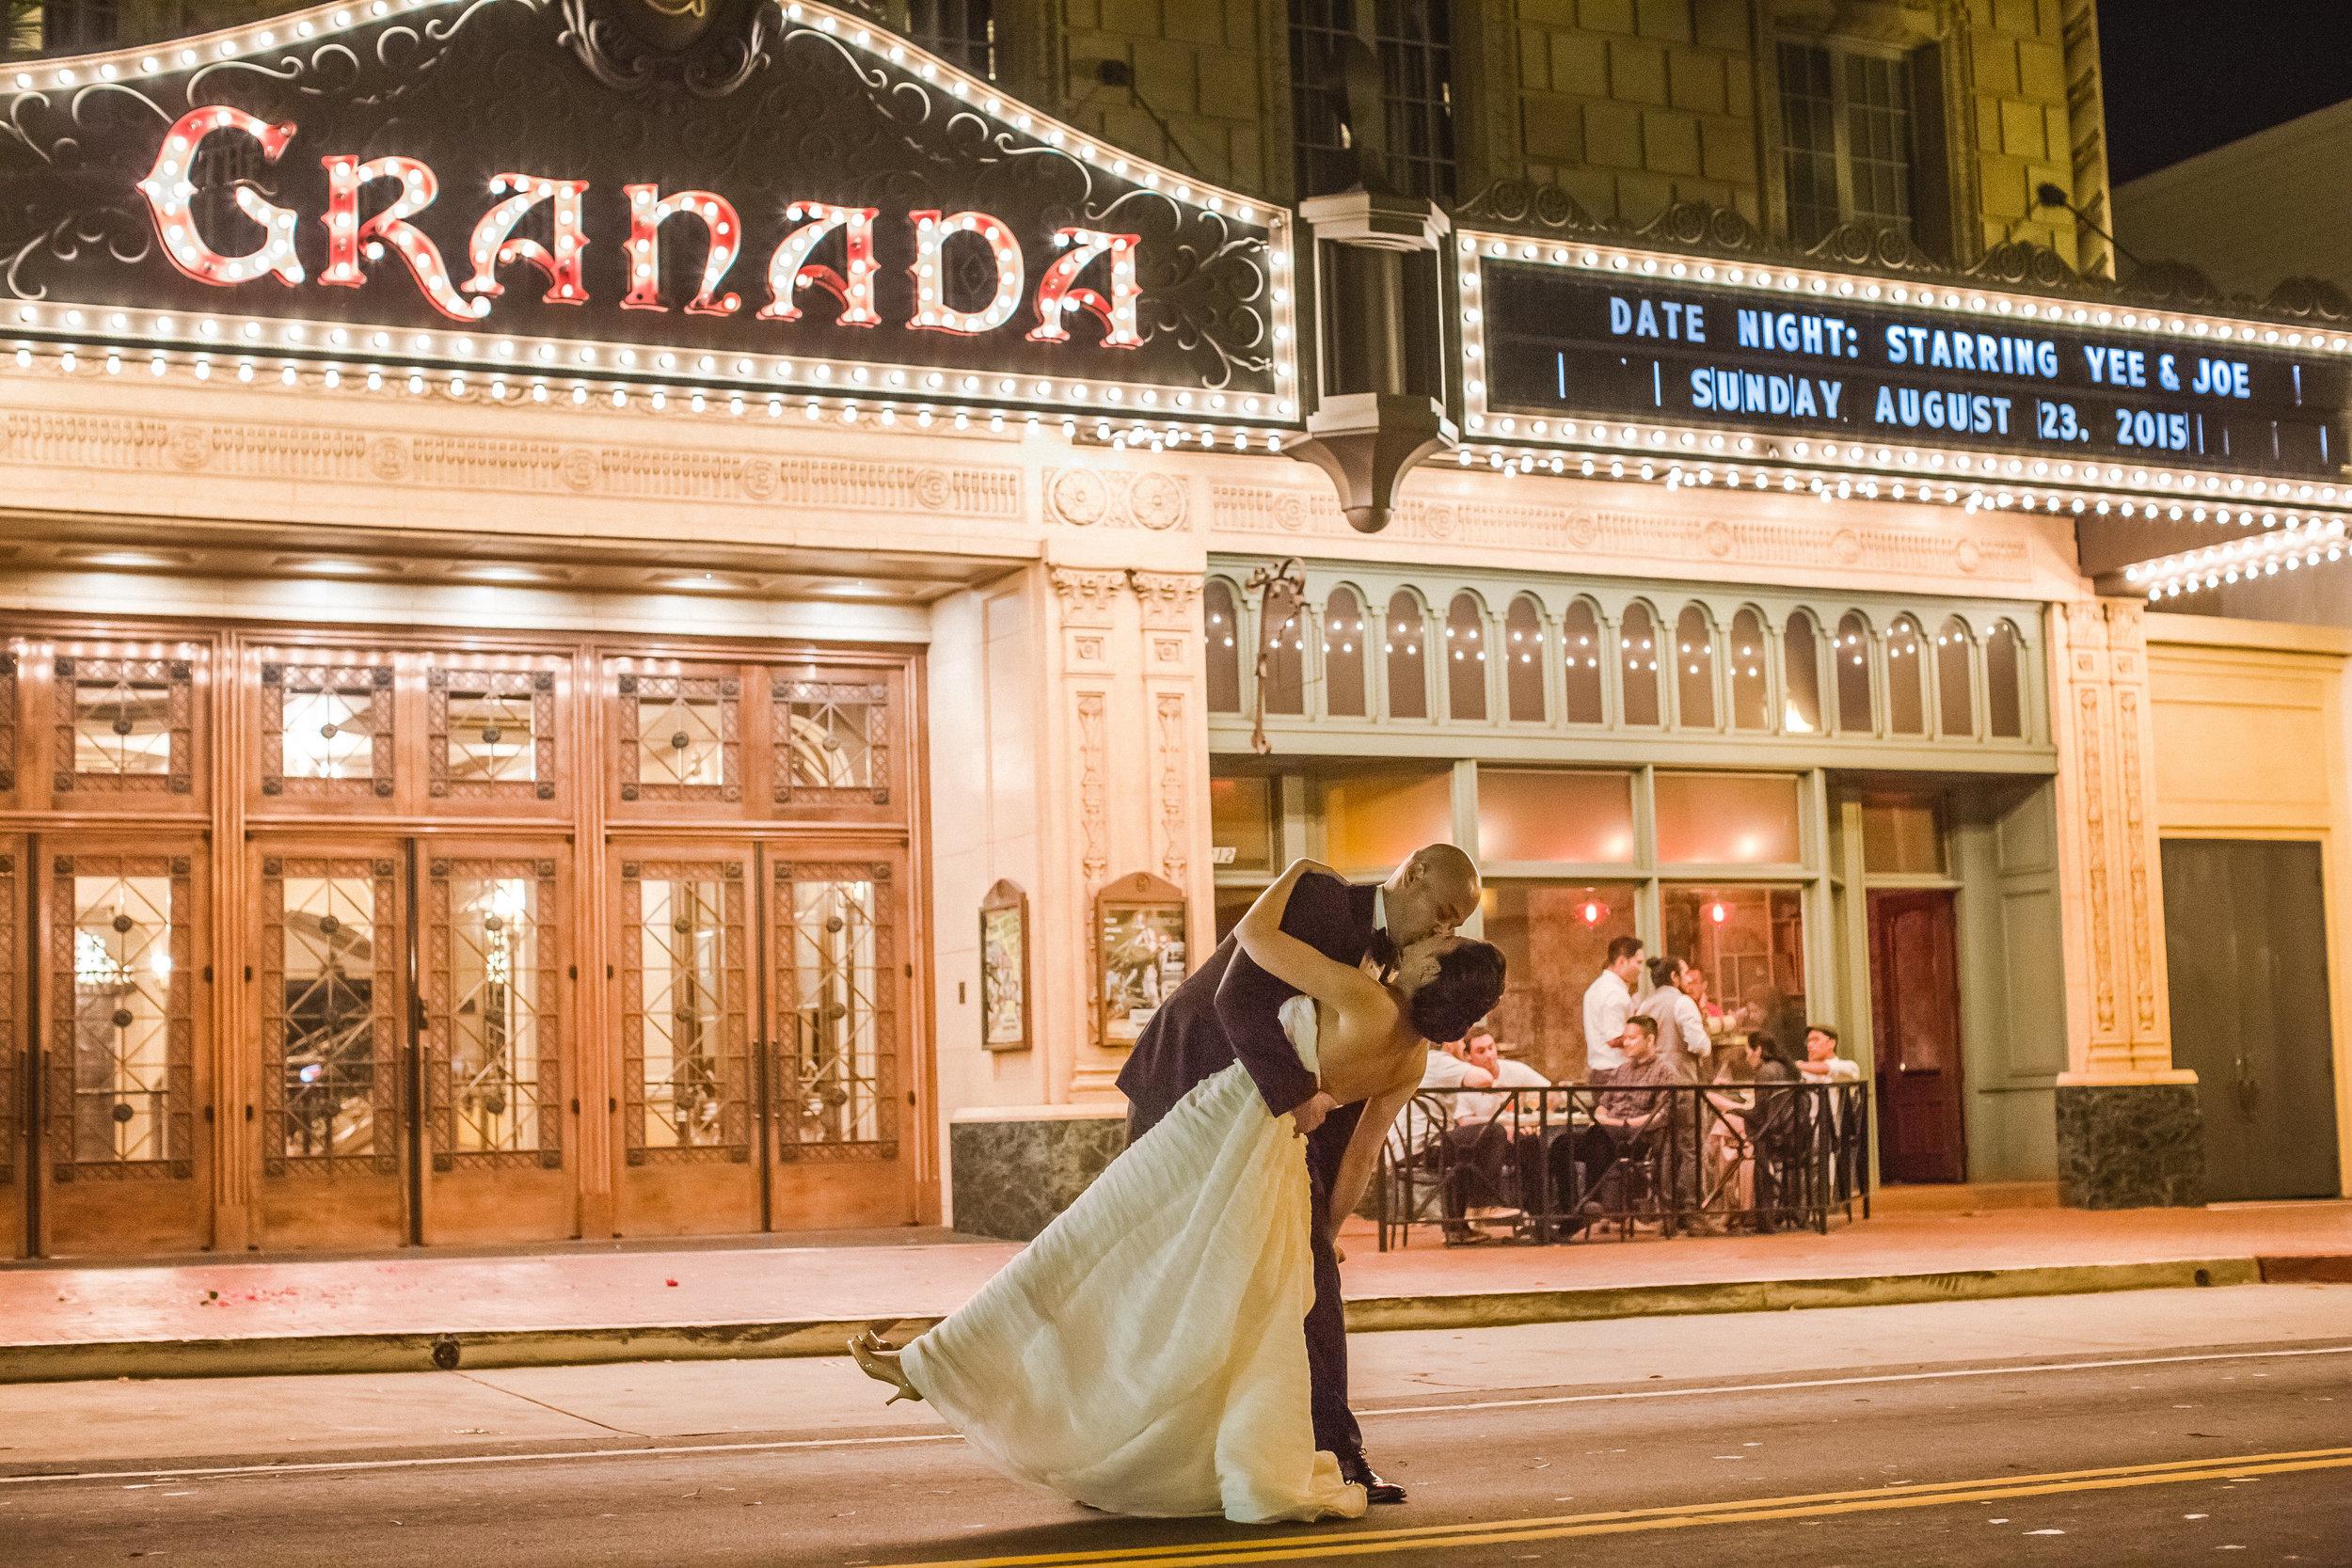 santabarbarawedding.com   The Granada Theatre   Theater Venue   Location Wedding Ceremony   Reception Venue   Marquis Photo